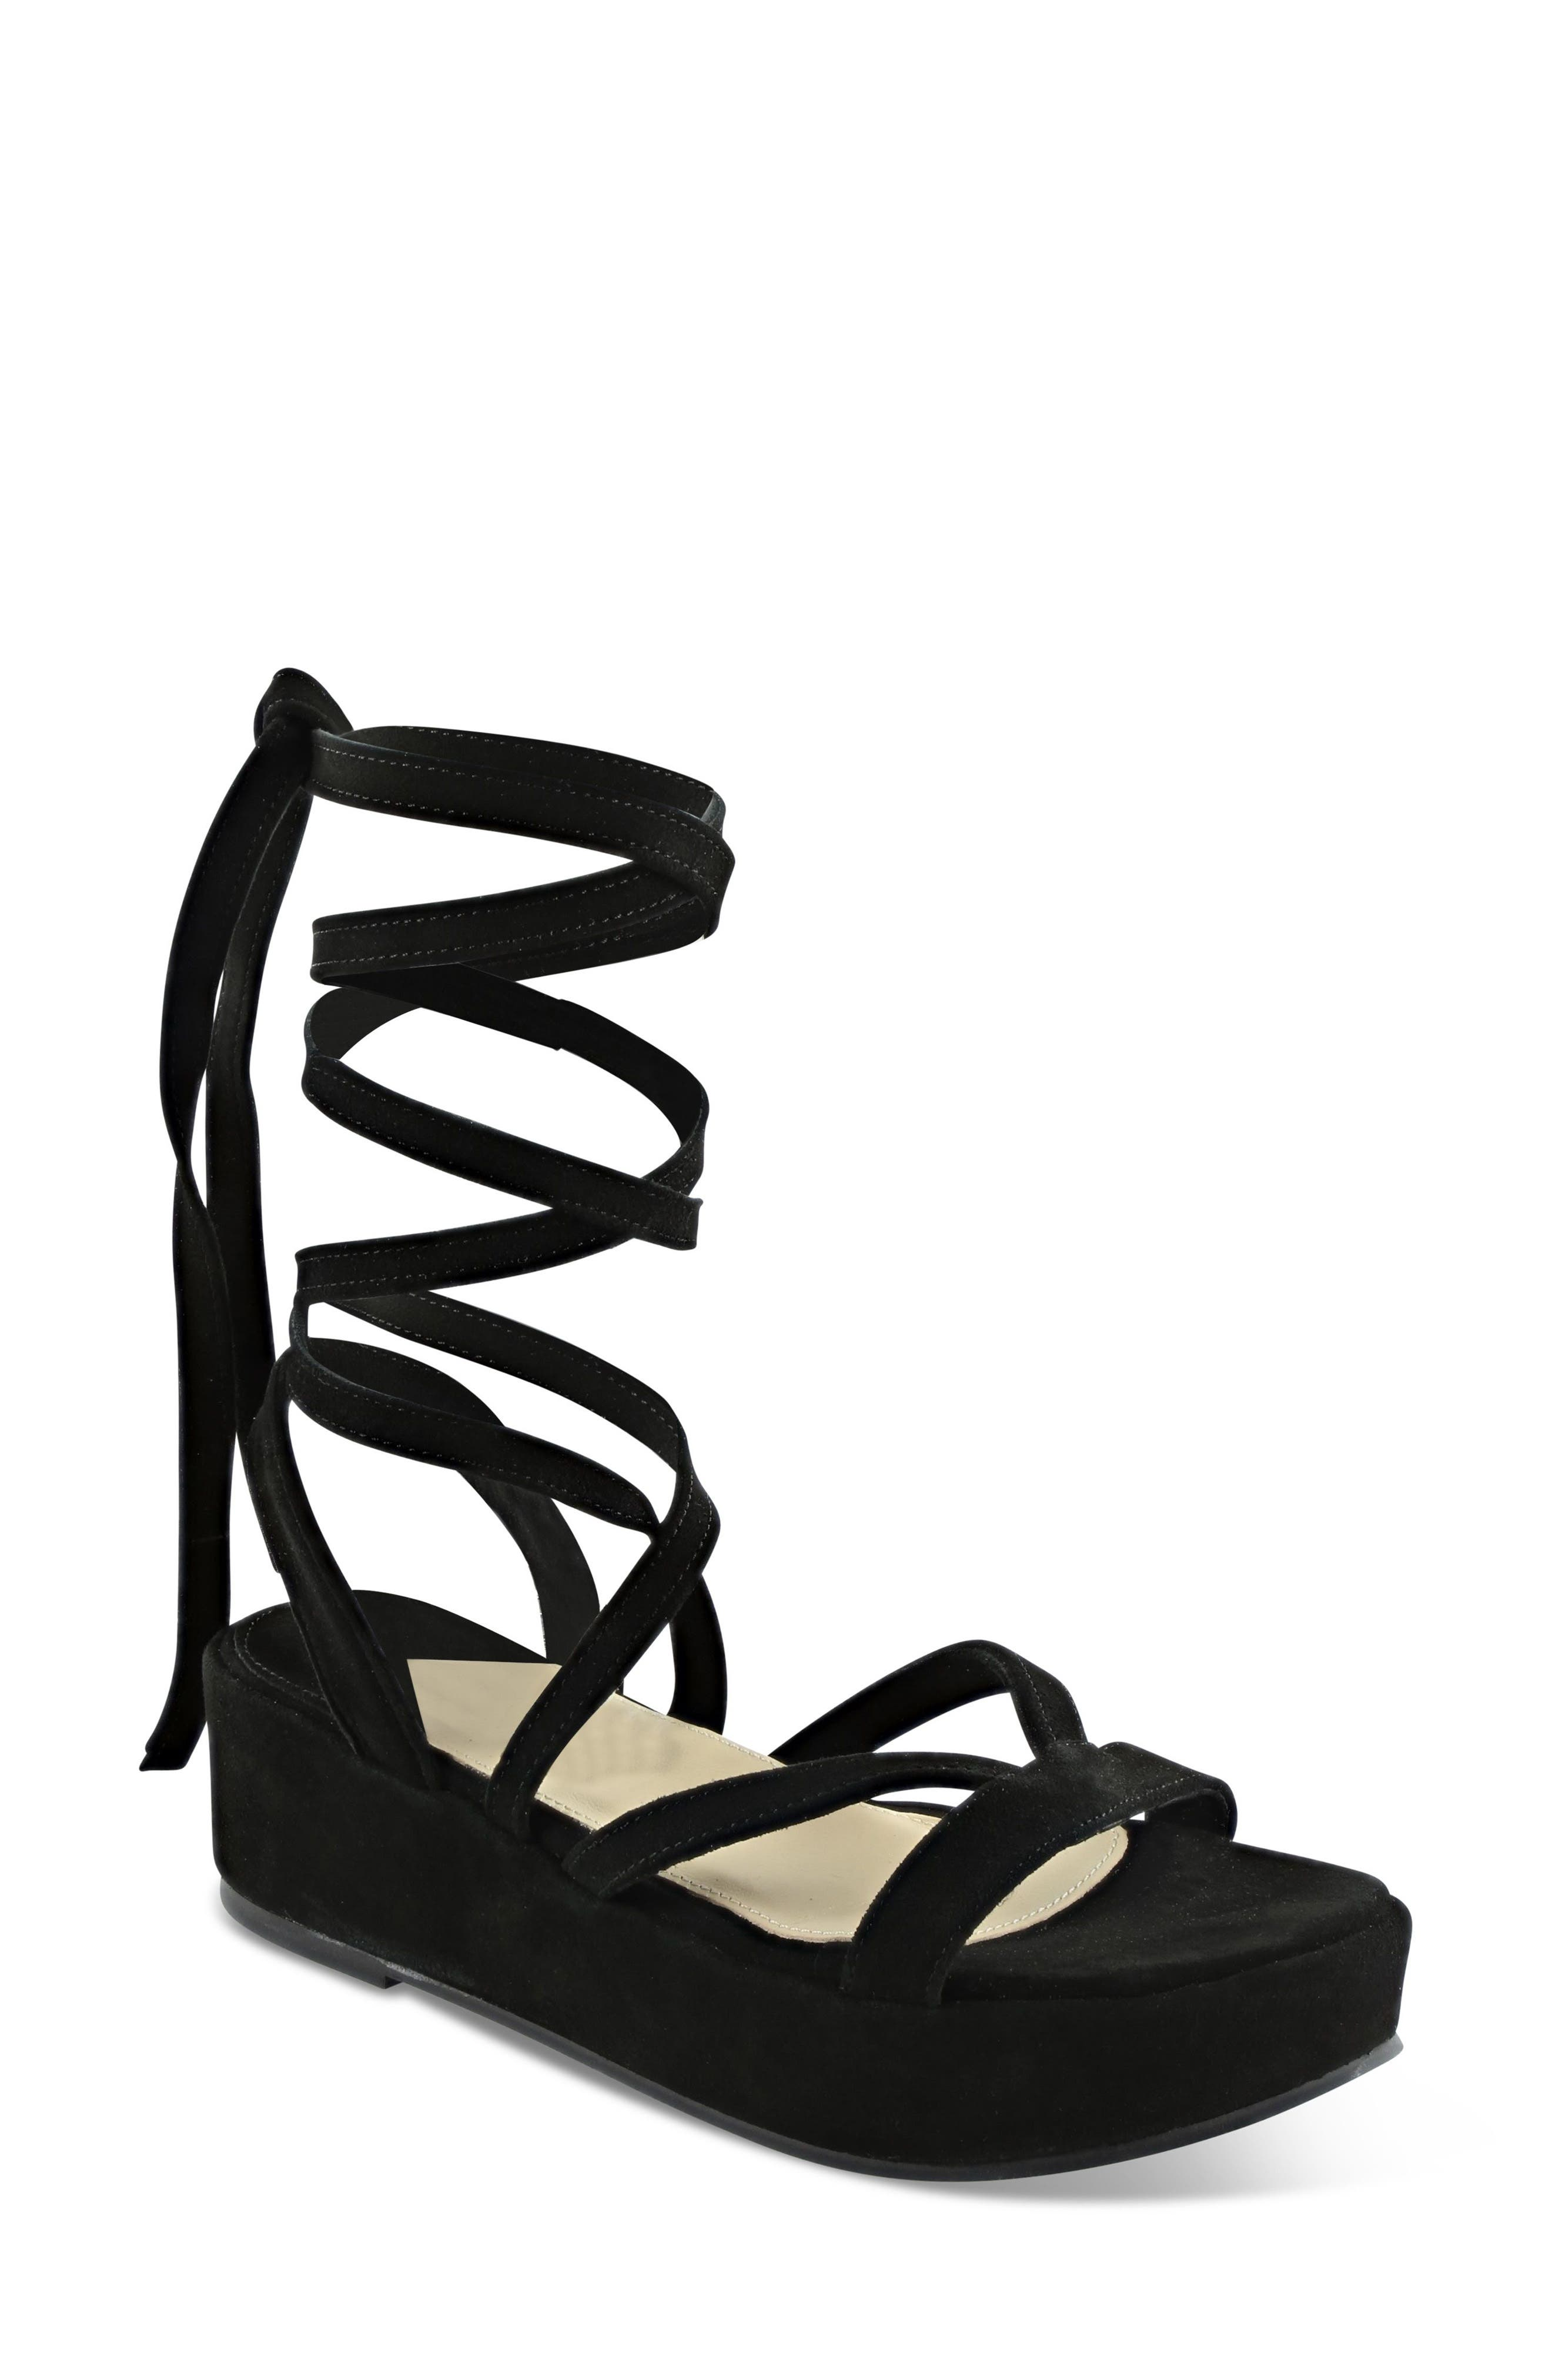 Keri Gladiator Platform Sandal,                             Main thumbnail 1, color,                             Black Suede